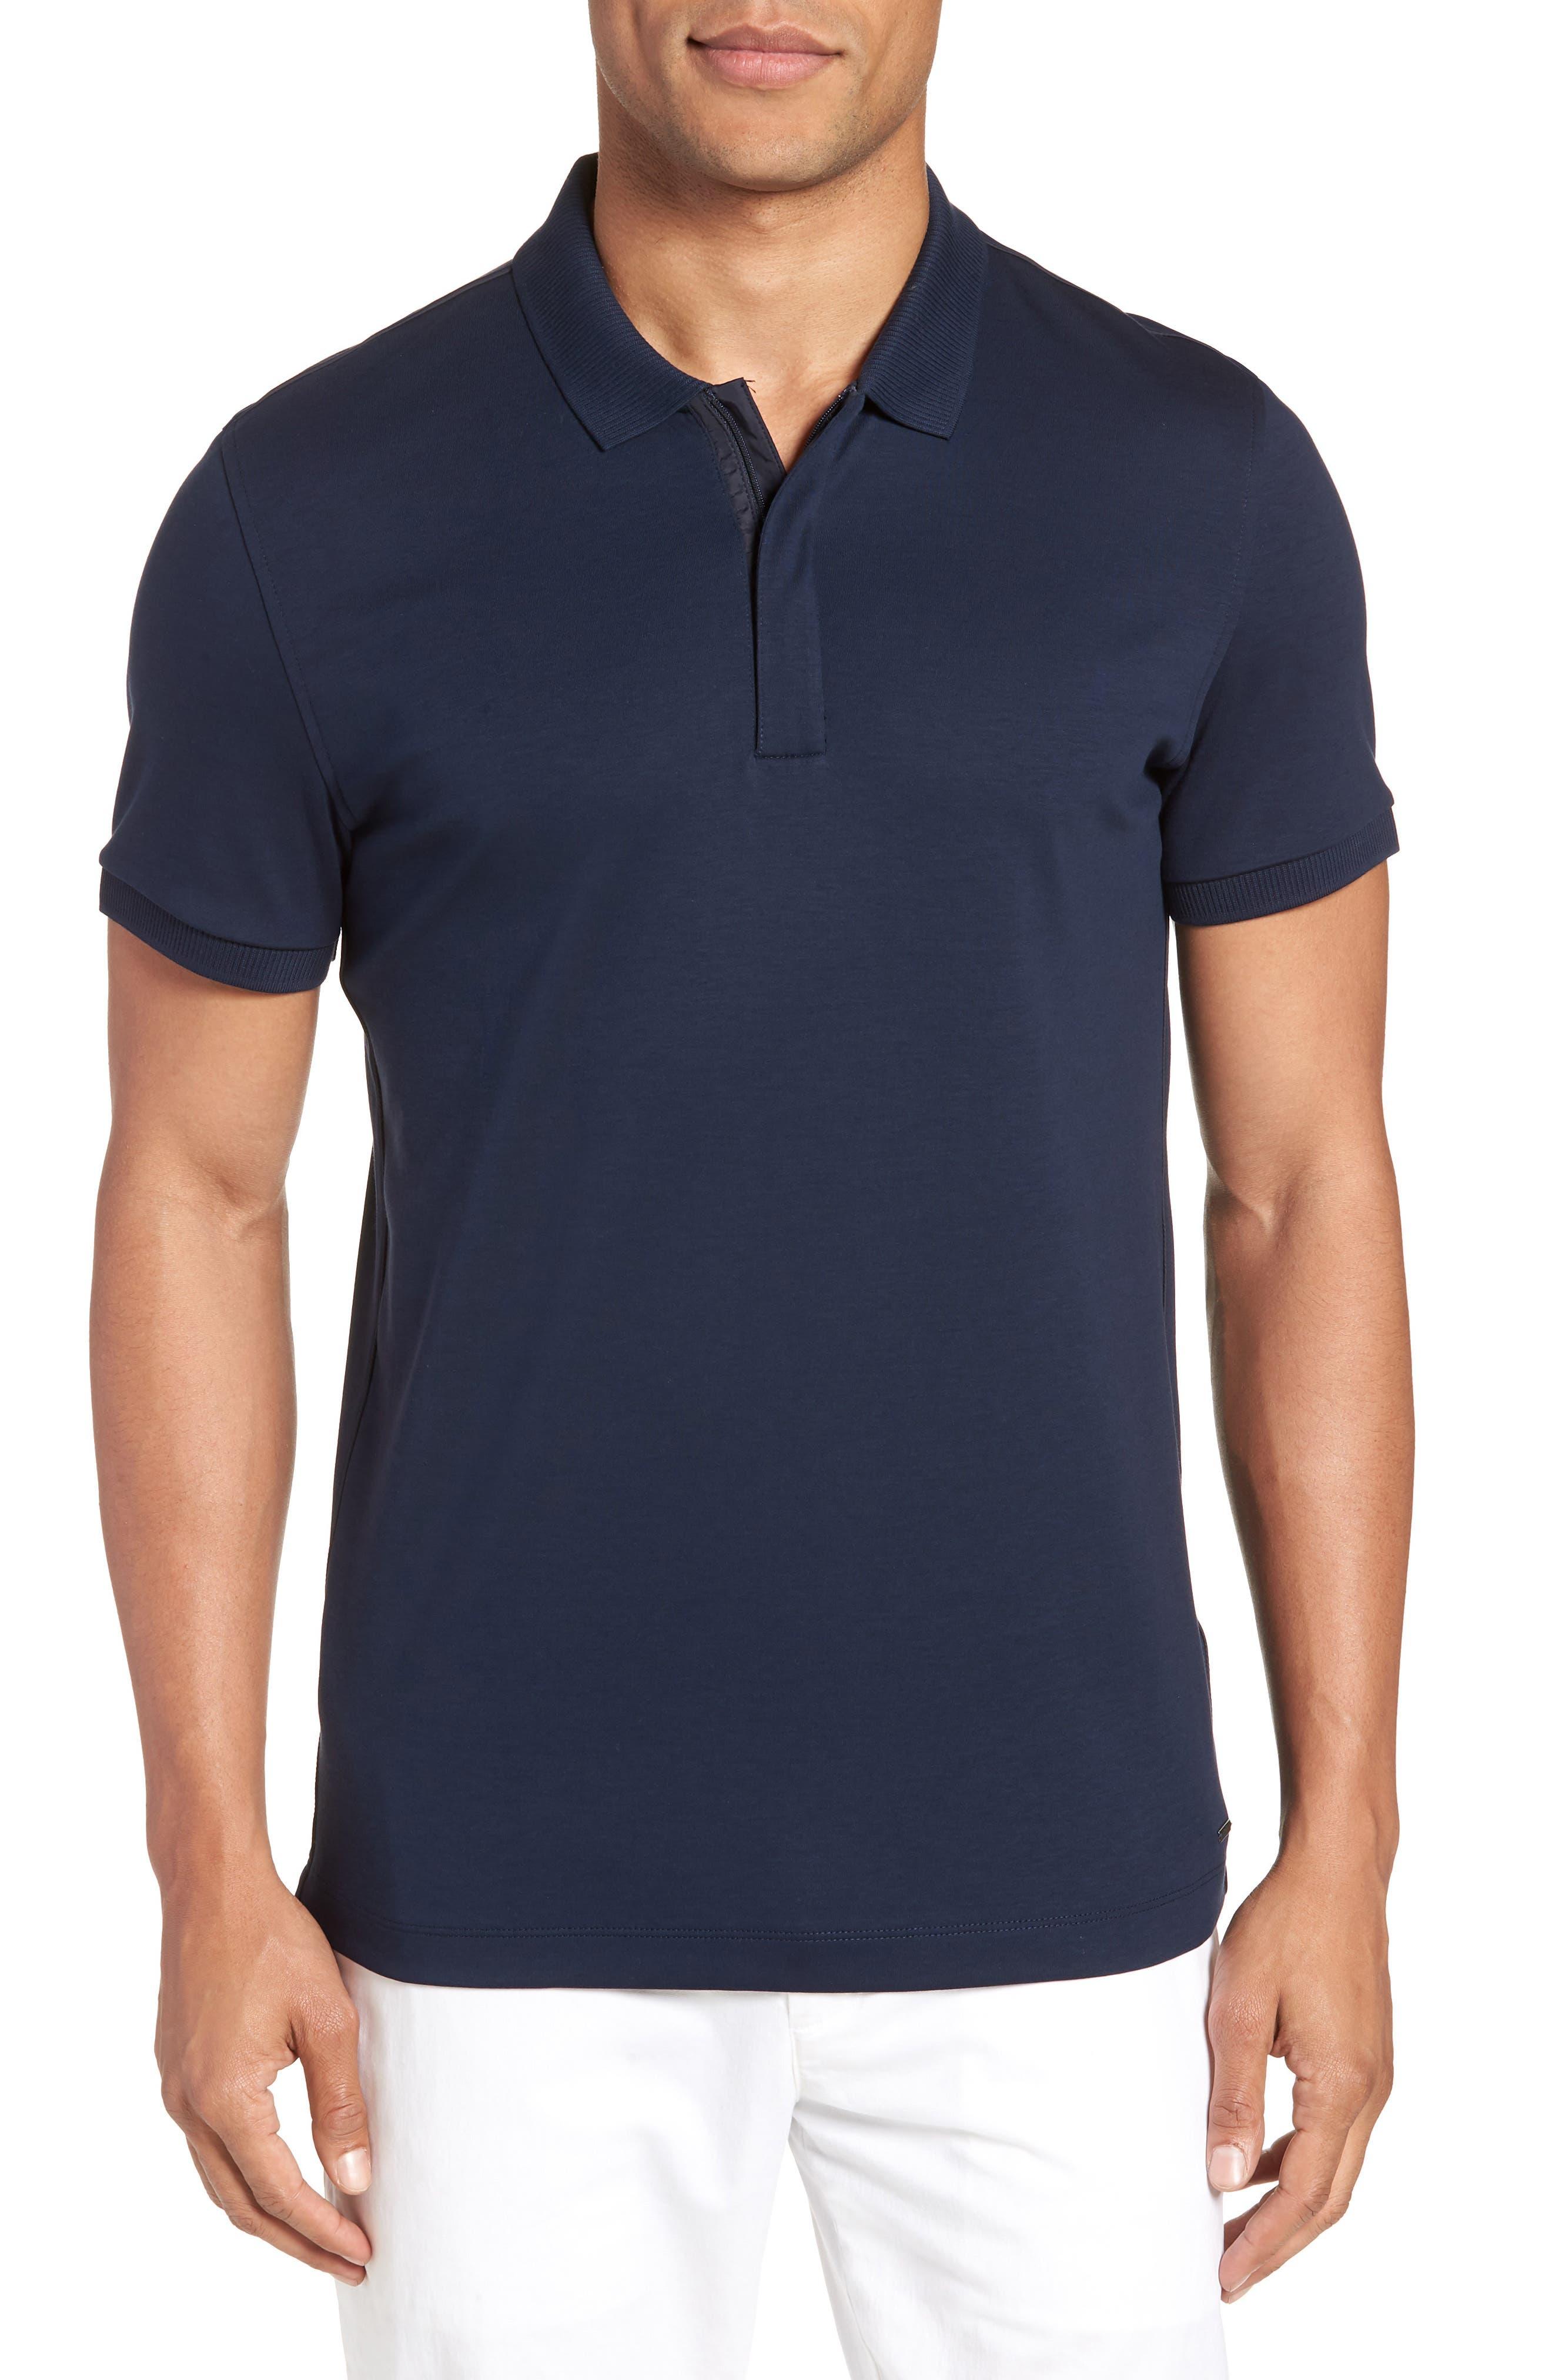 Pohl Polo Shirt,                             Main thumbnail 1, color,                             Blue